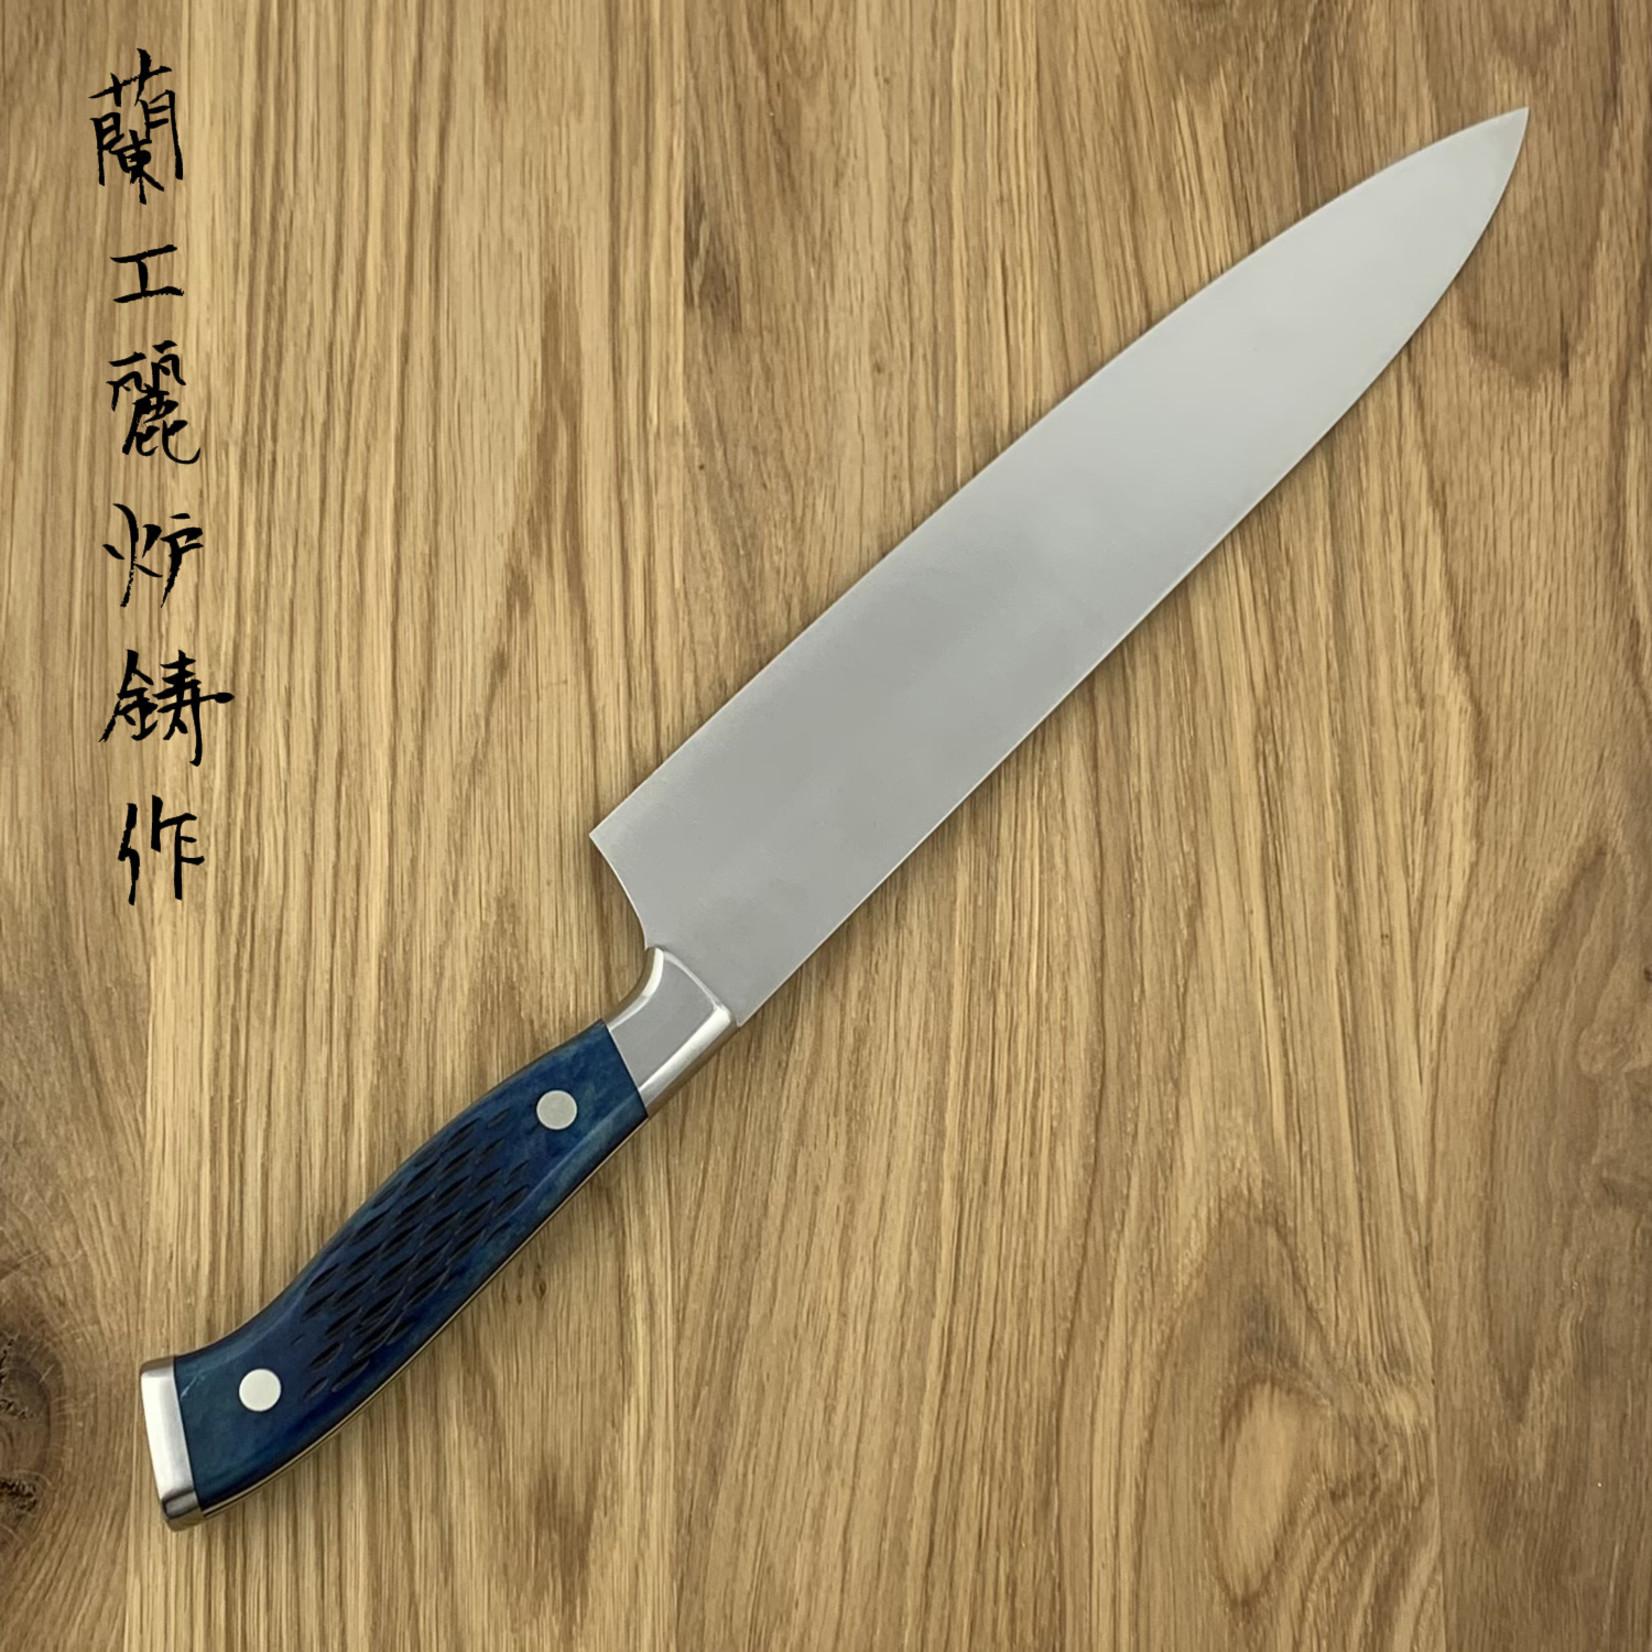 NENOHI NENOX Premium blue gyuto 240 mm